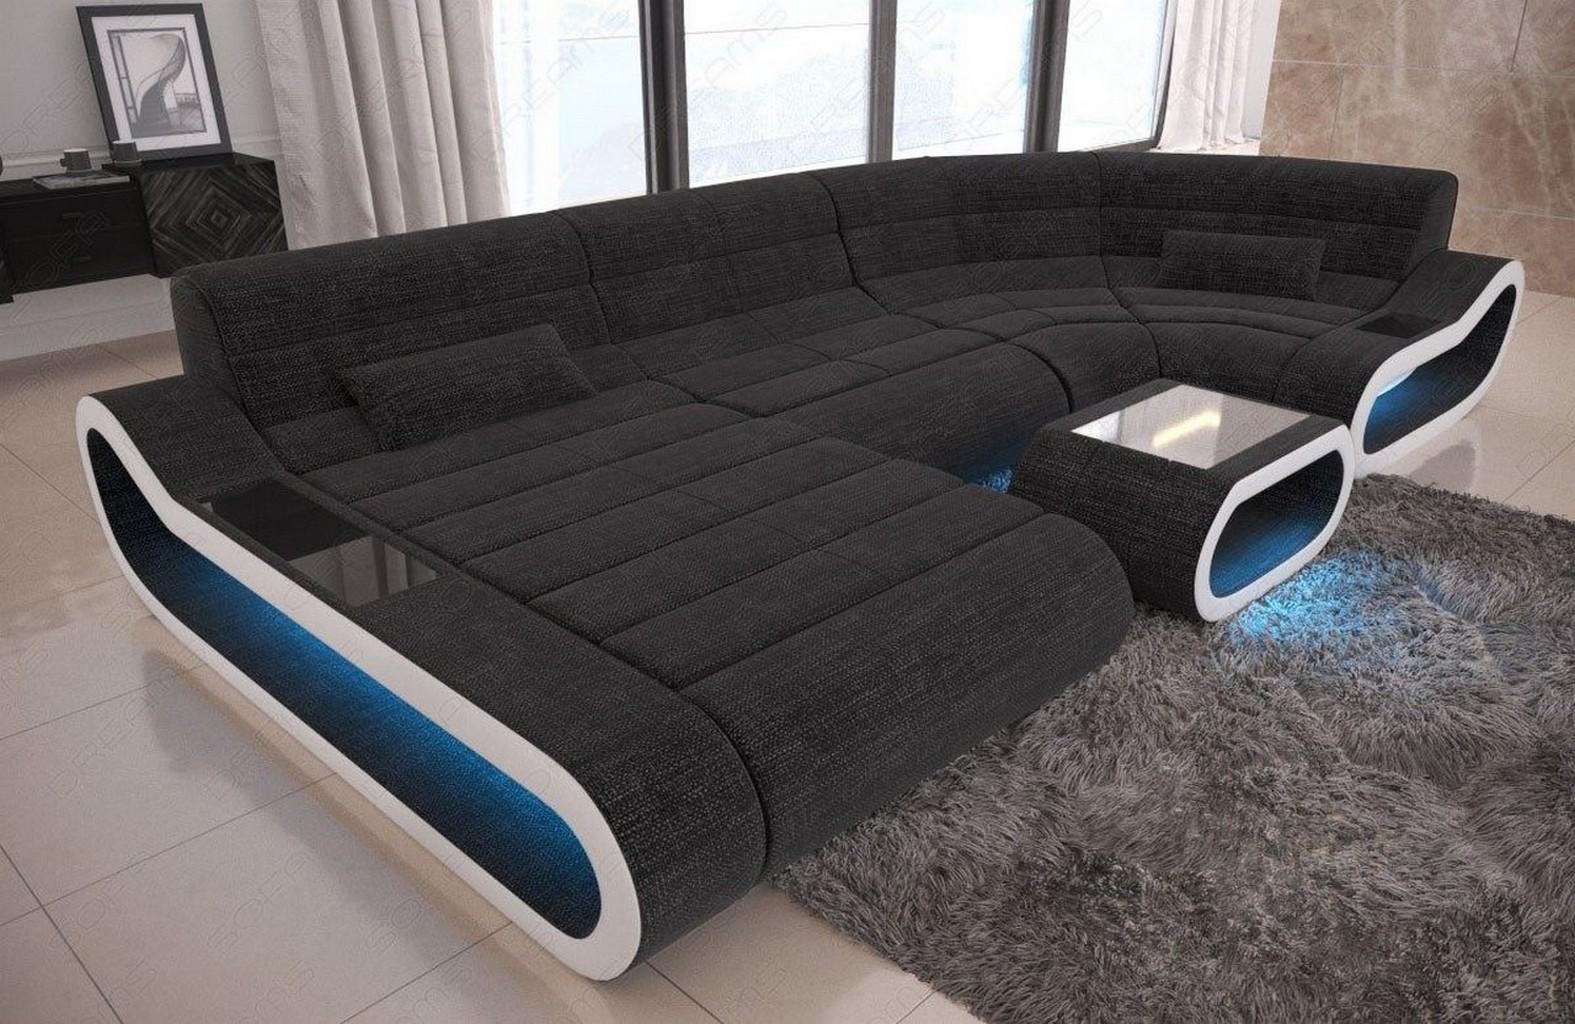 wohnlandschaft stoff leder mix ecksofa concept u form couch garnitur sofa dreams ebay